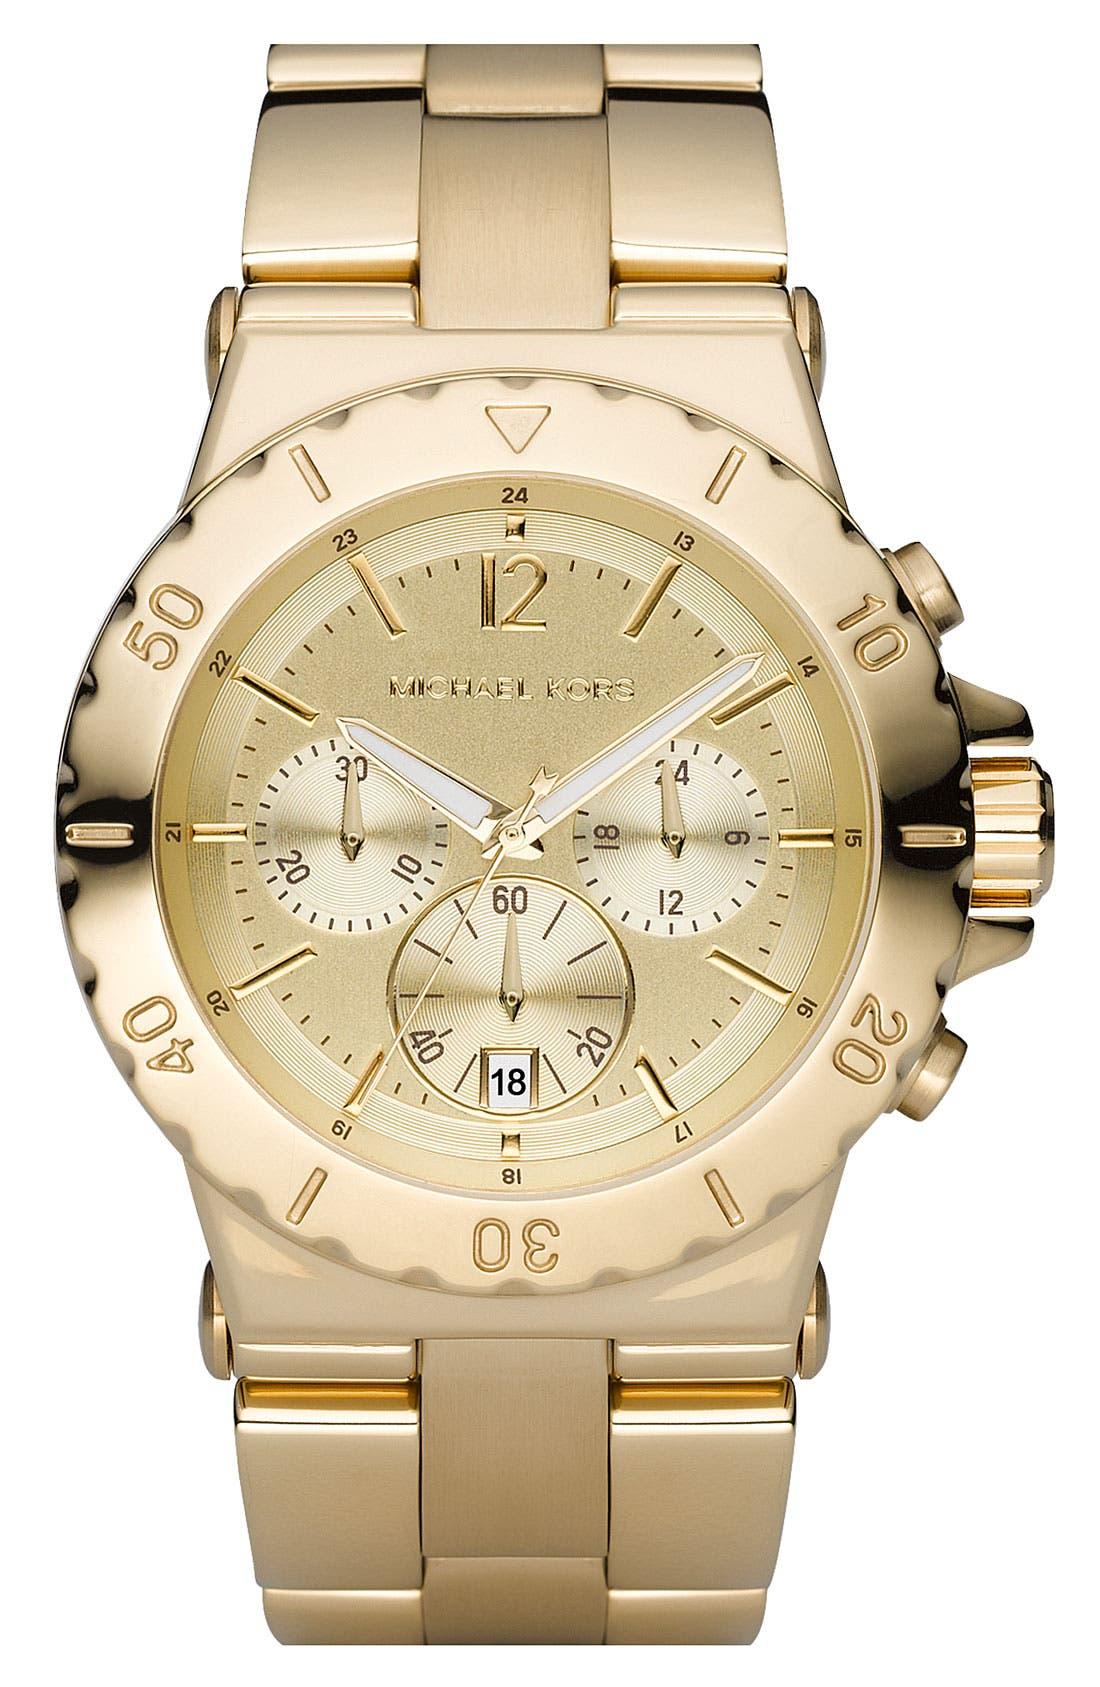 Main Image - Michael Kors Rose Gold Chronograph Watch, 42mm